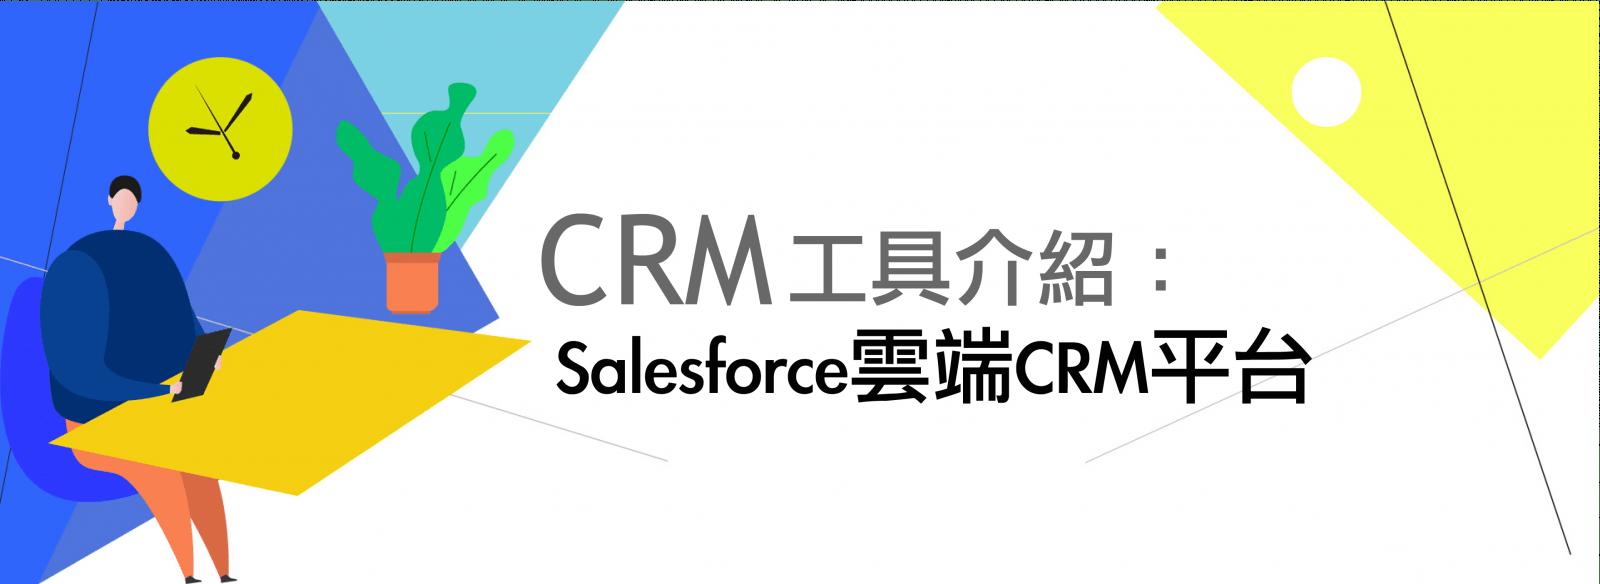 Salesforce雲端CRM平台